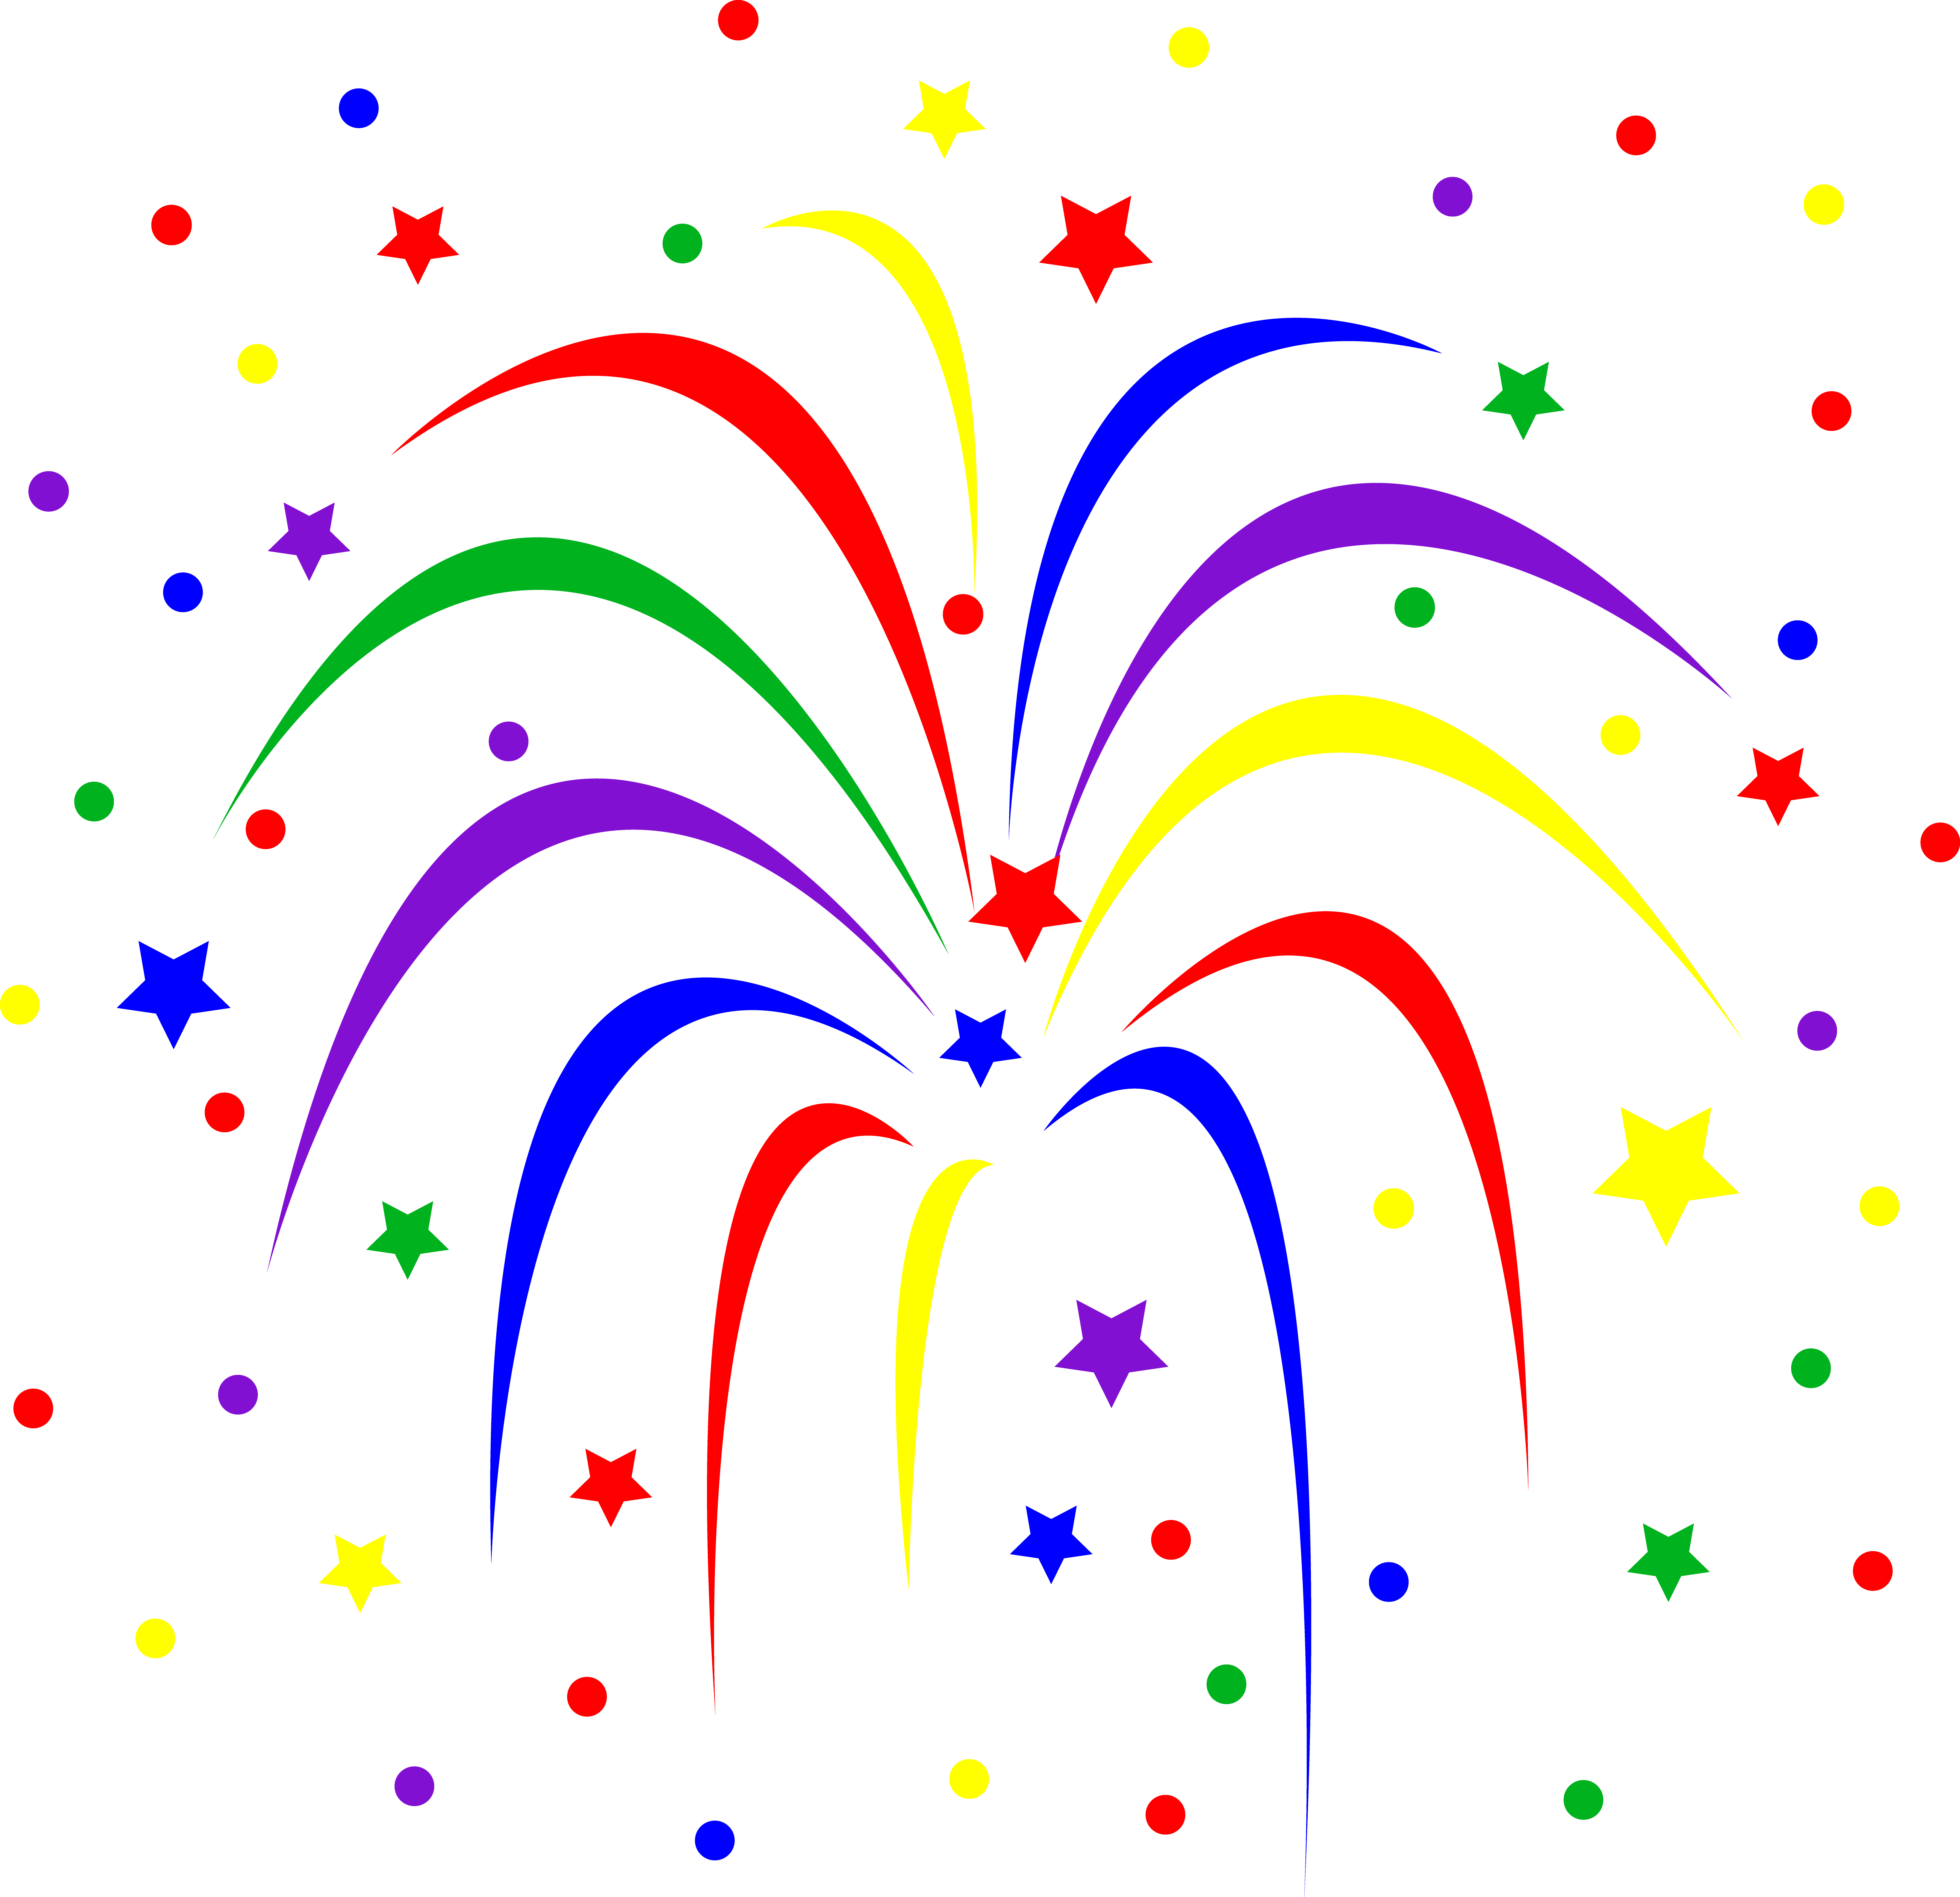 Free Clip Art Celebration - Cliparts.co